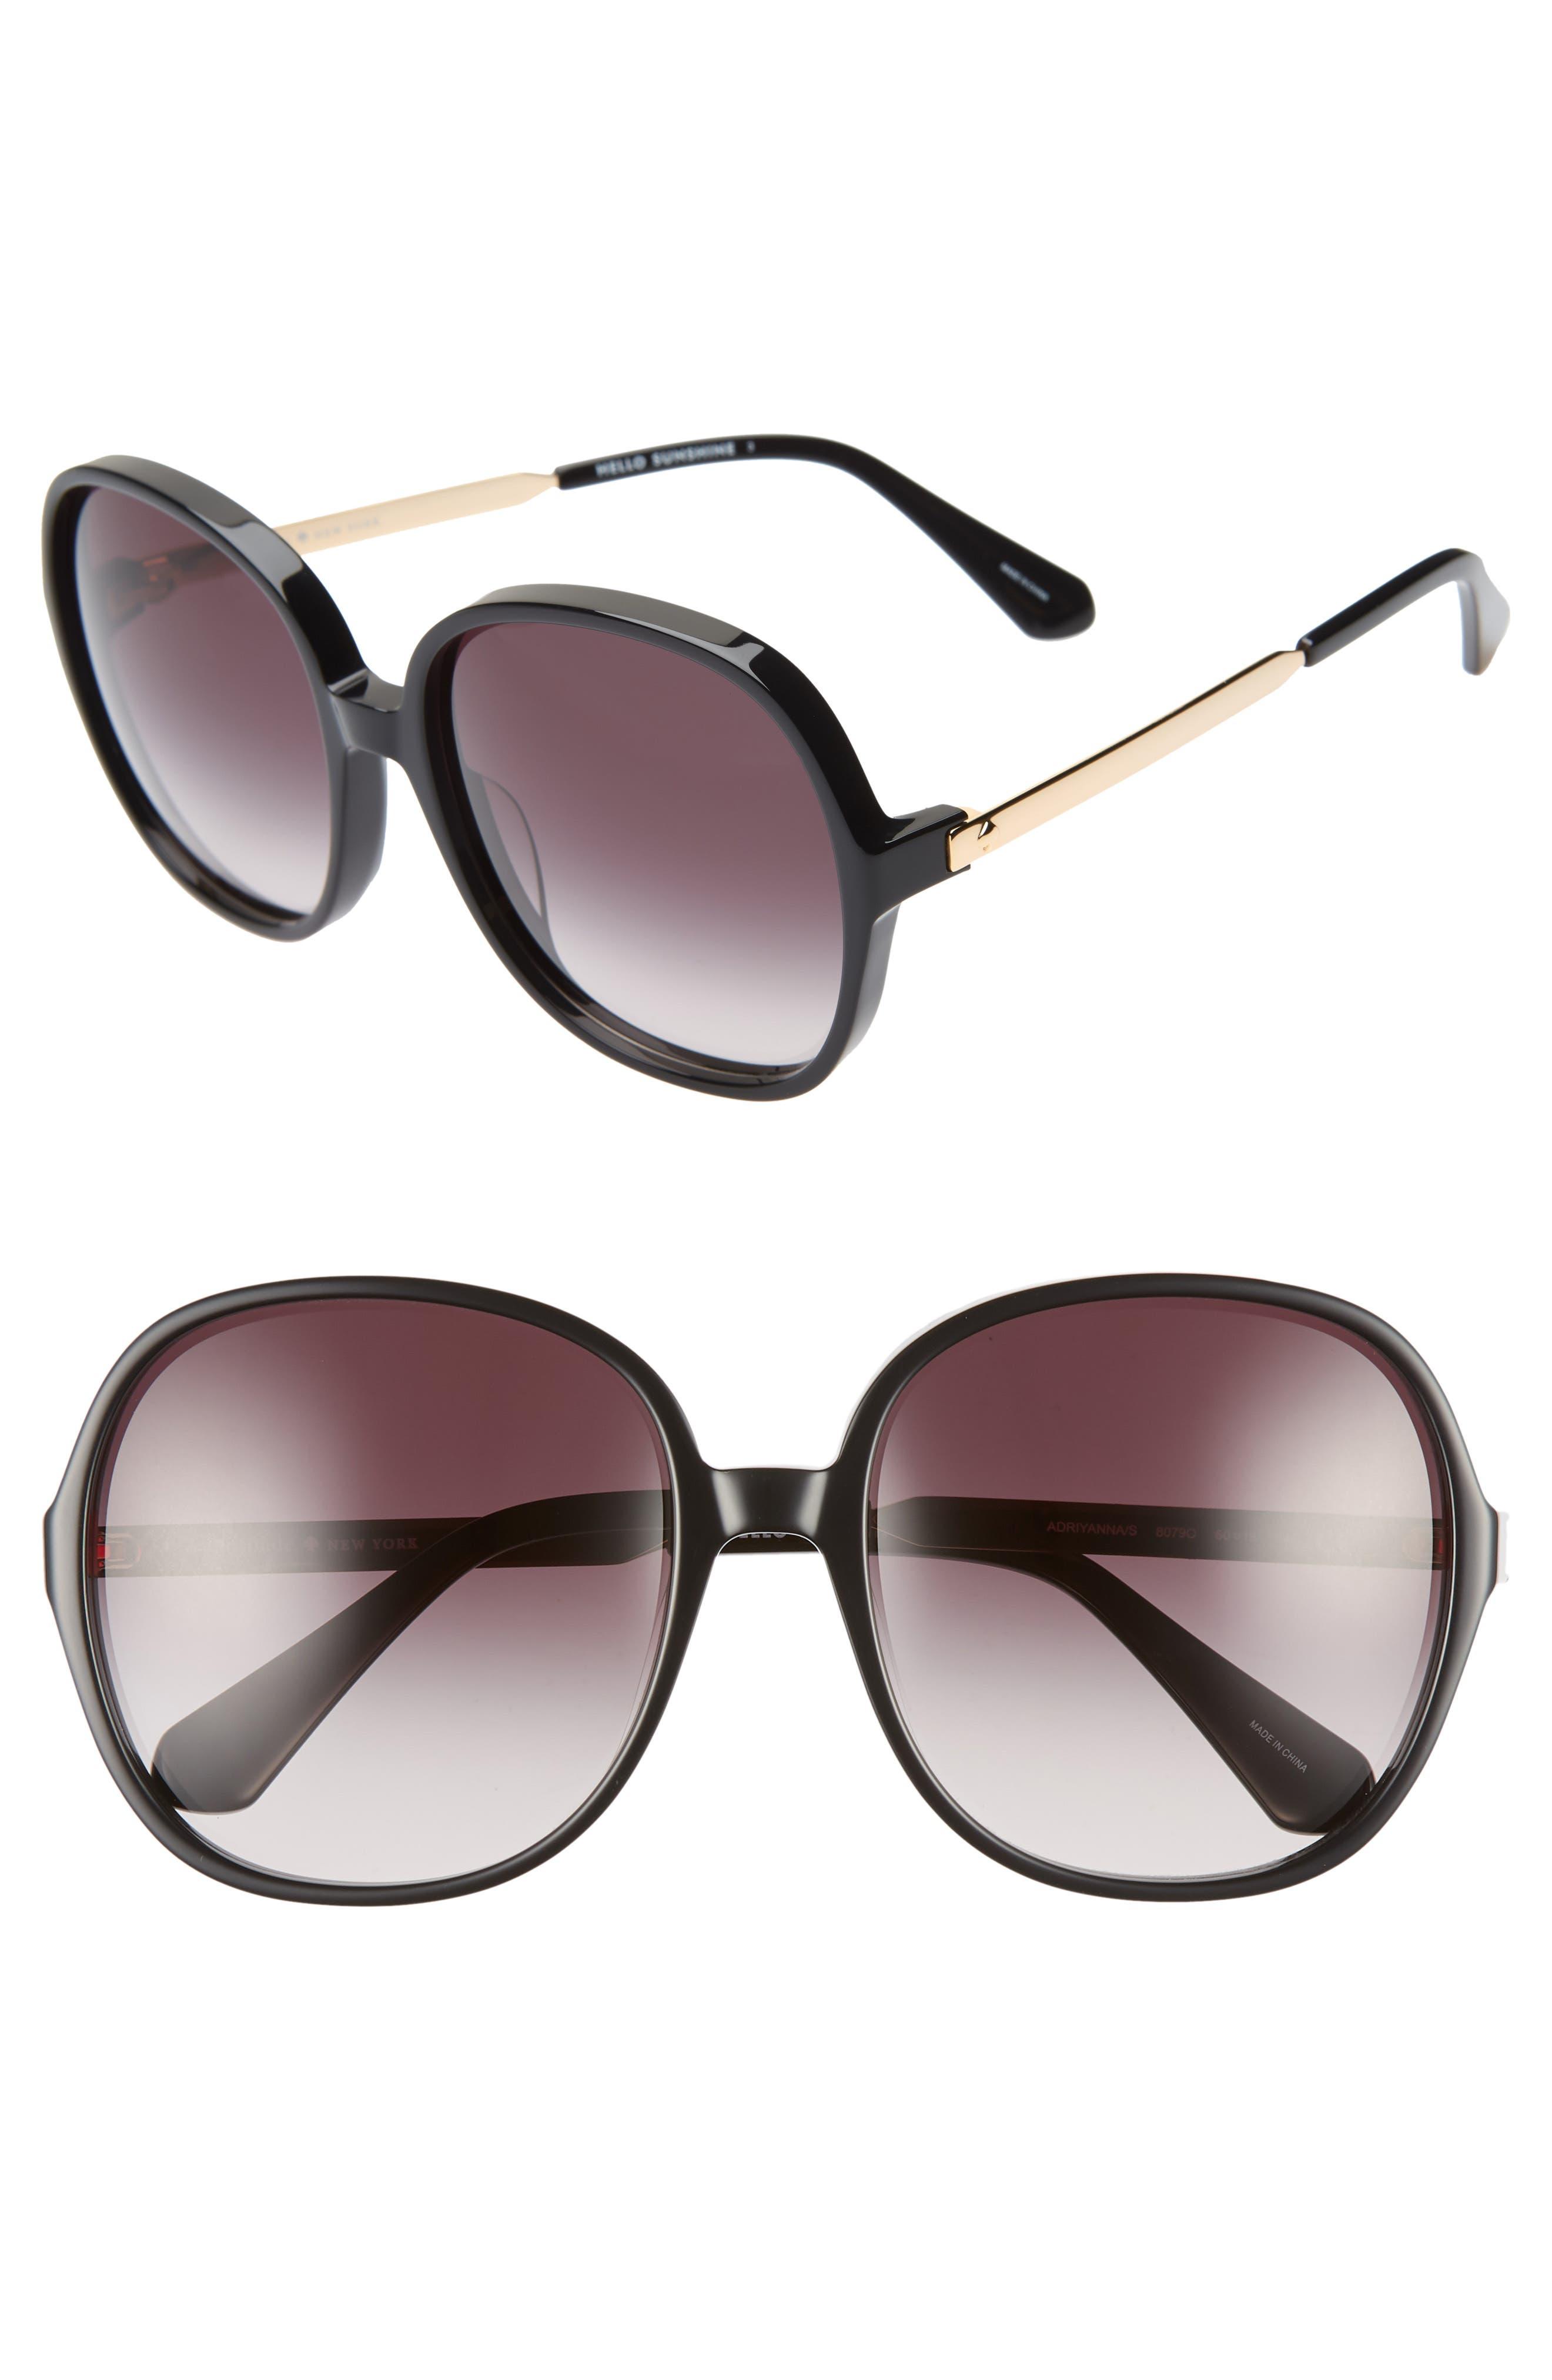 KATE SPADE NEW YORK,                             adriyanna 60mm round sunglasses,                             Main thumbnail 1, color,                             BLACK